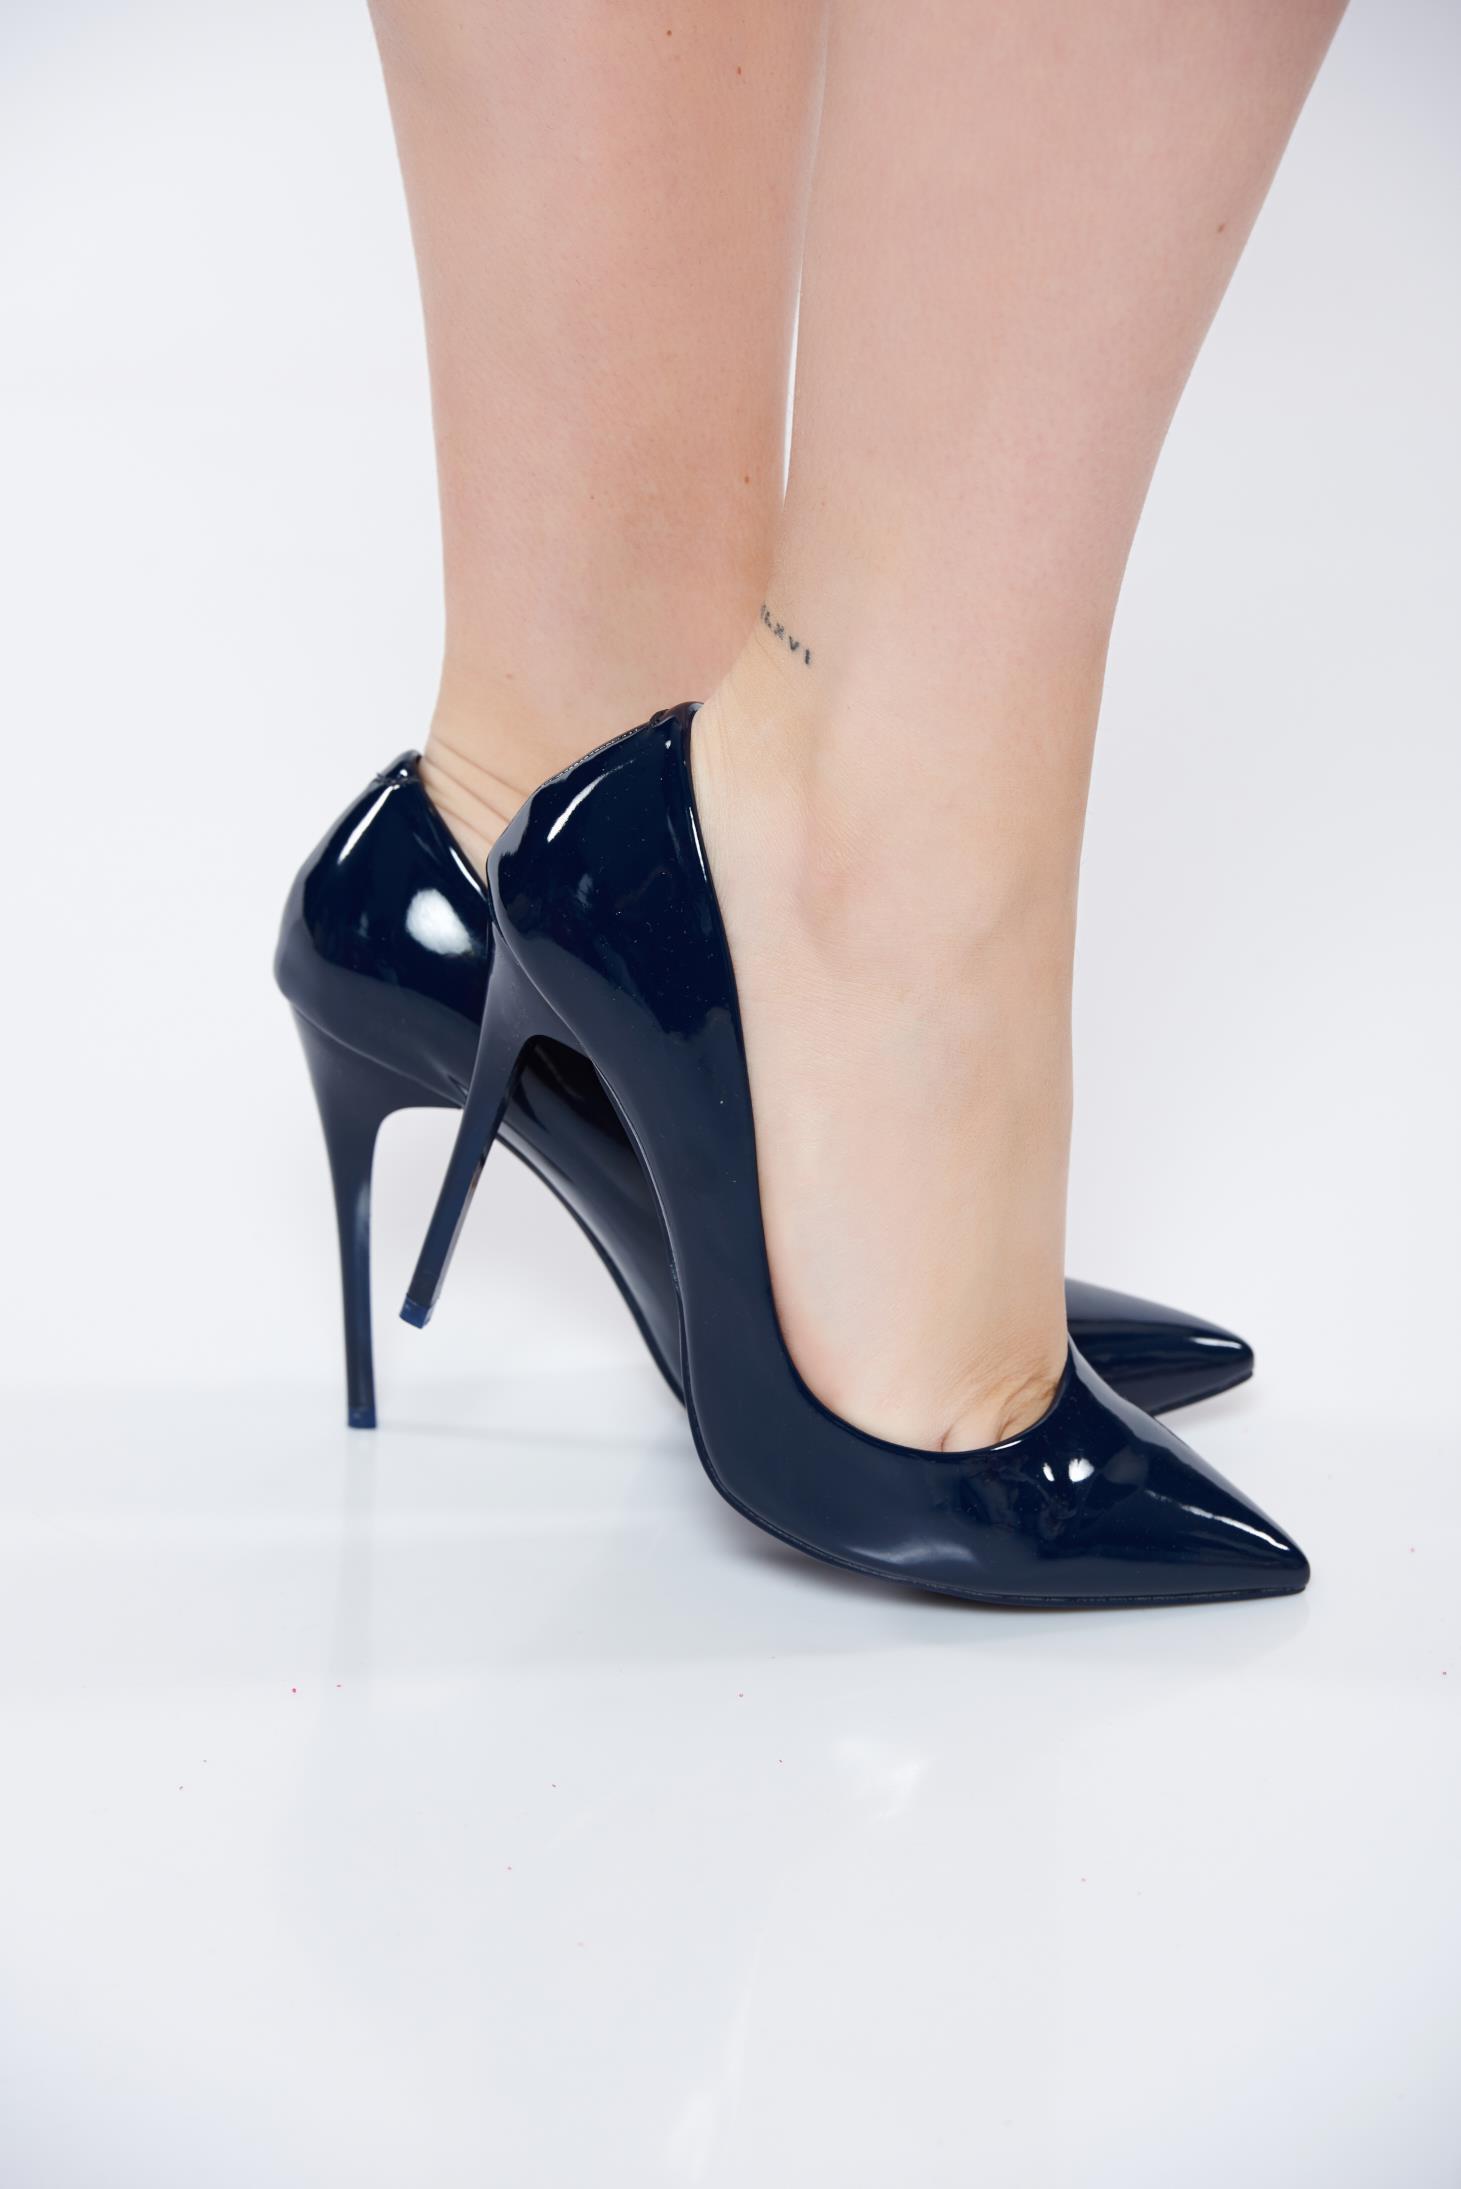 963fb43fae5 Darkblue shoes from ecological varnished leather stiletto elegant